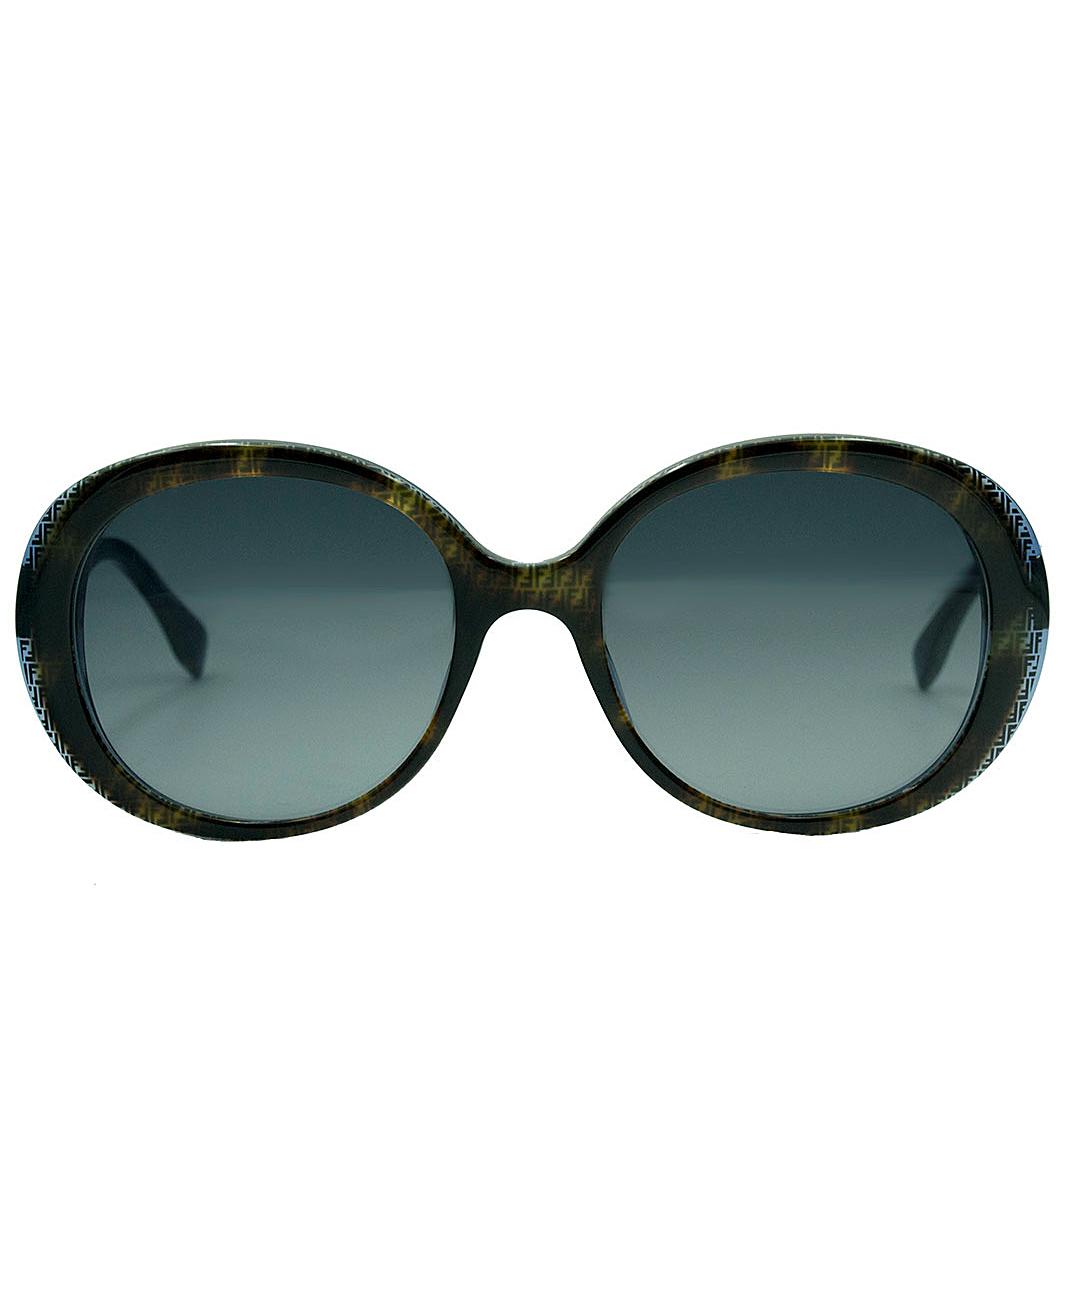 1e09a90d6d Fendi Modified Plastic Sunglasses